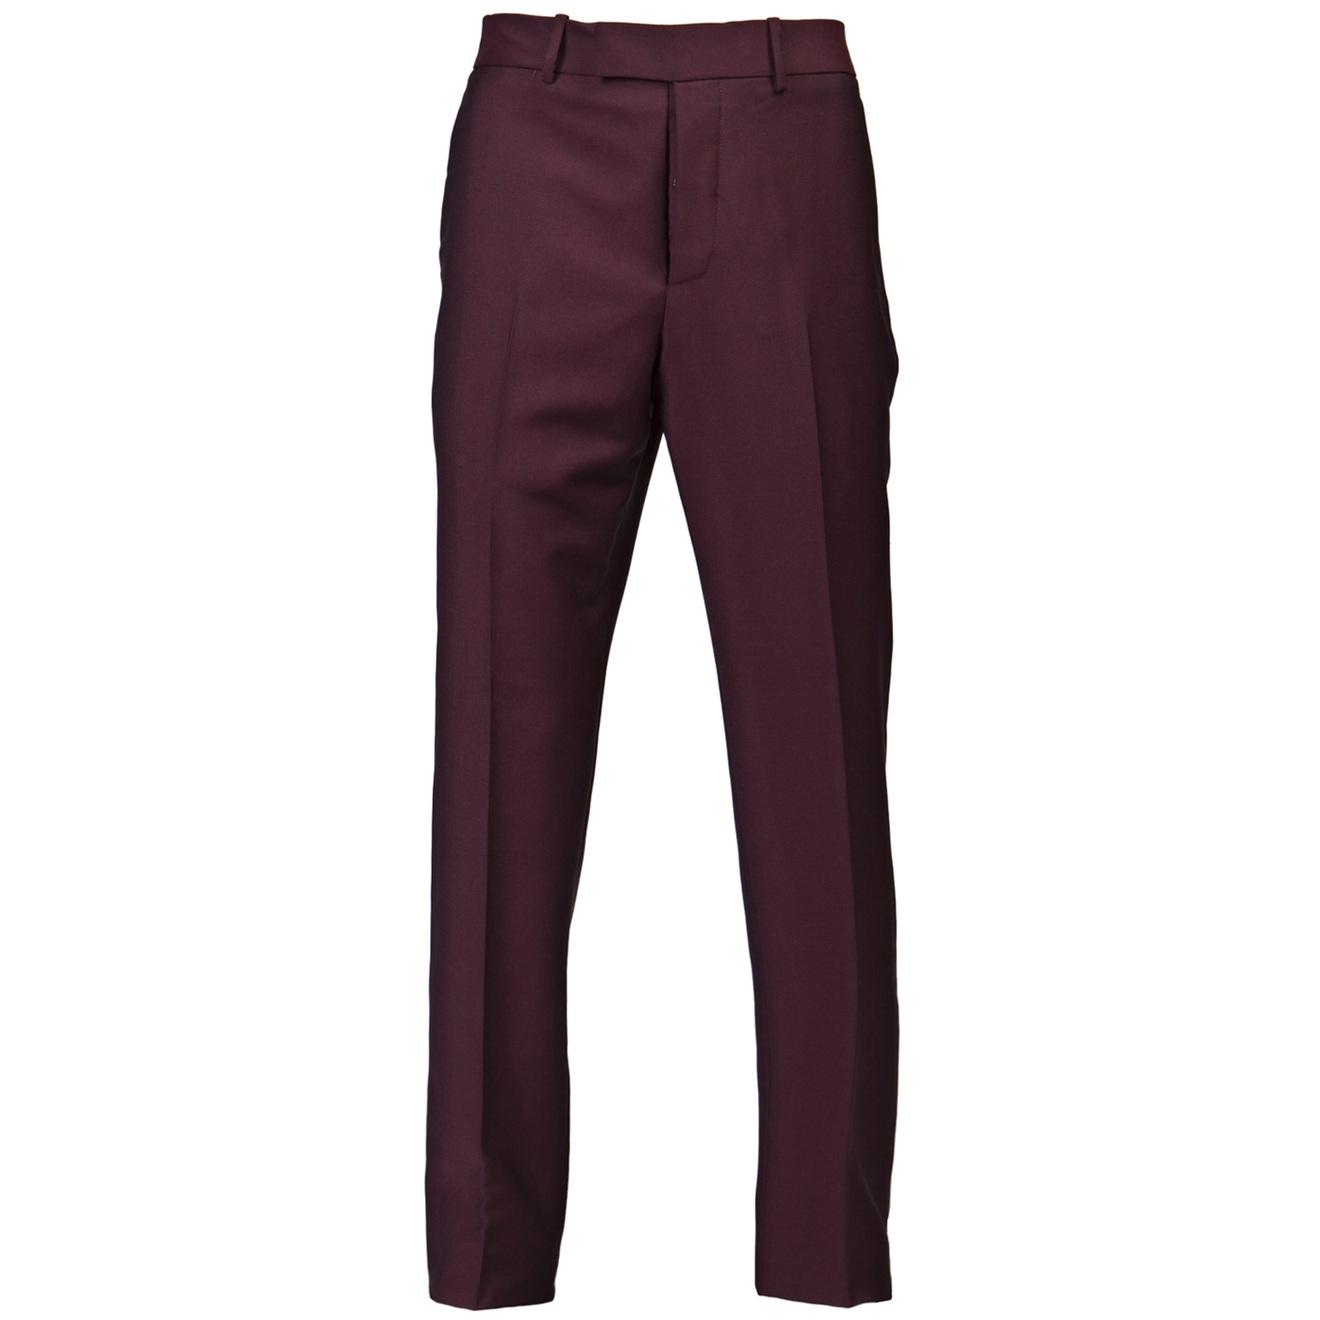 Model Maroon Pants Womens  Original Purple Maroon Pants Womens Trend U2013 Playzoa.com